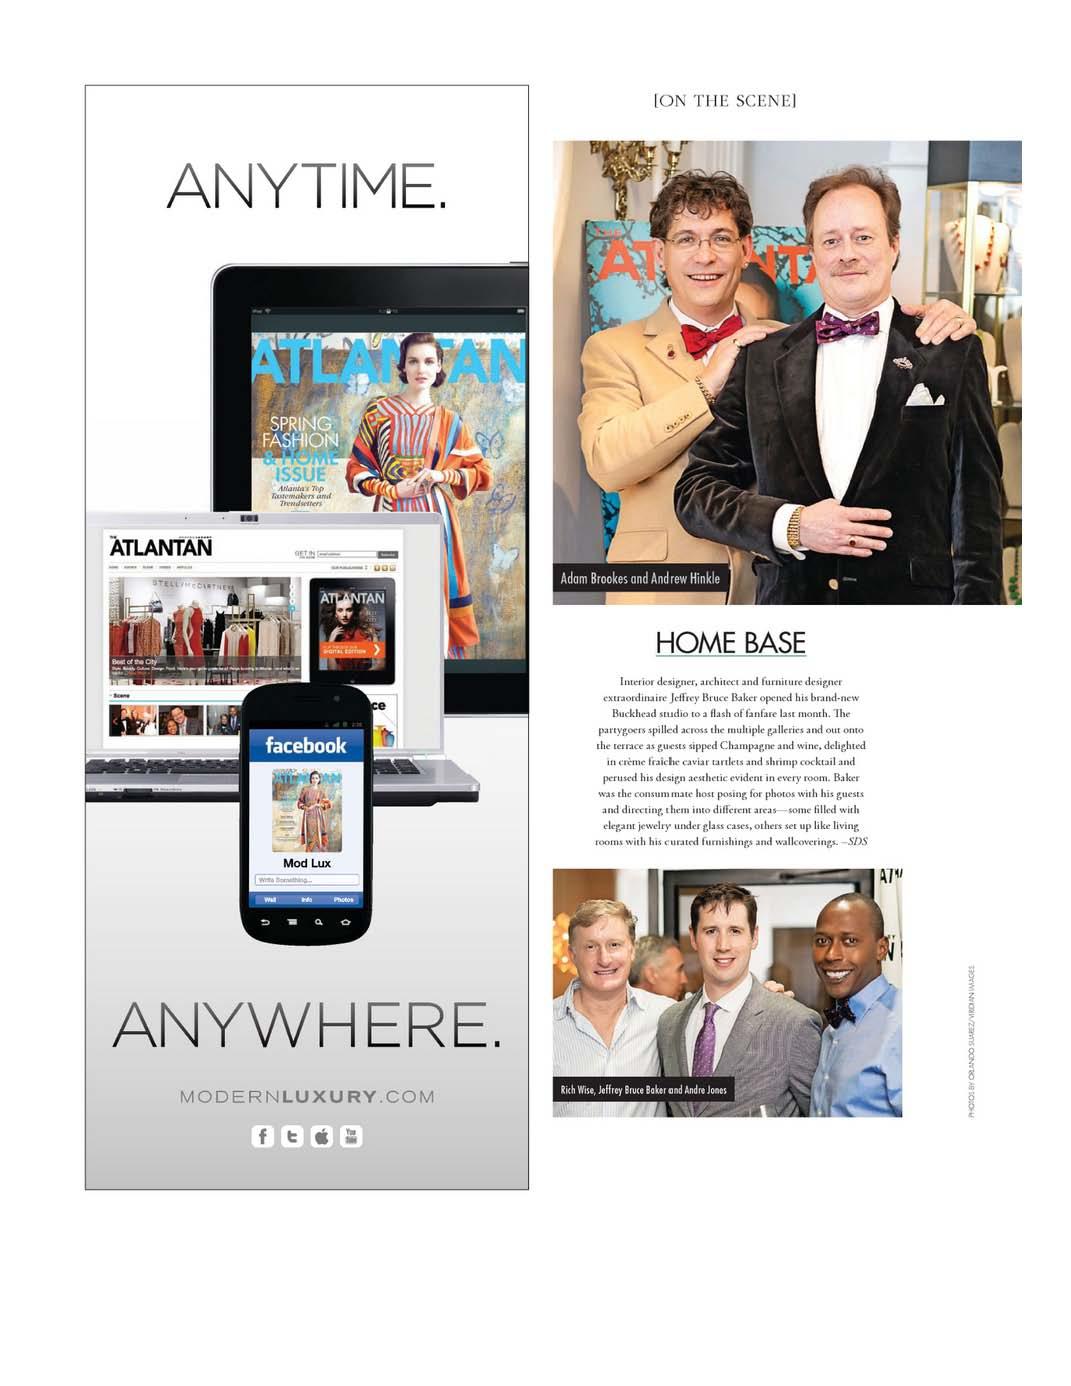 The-Atlantan-April _ Modern Luxury-Jeffrey-Bruce-Baker02.jpg